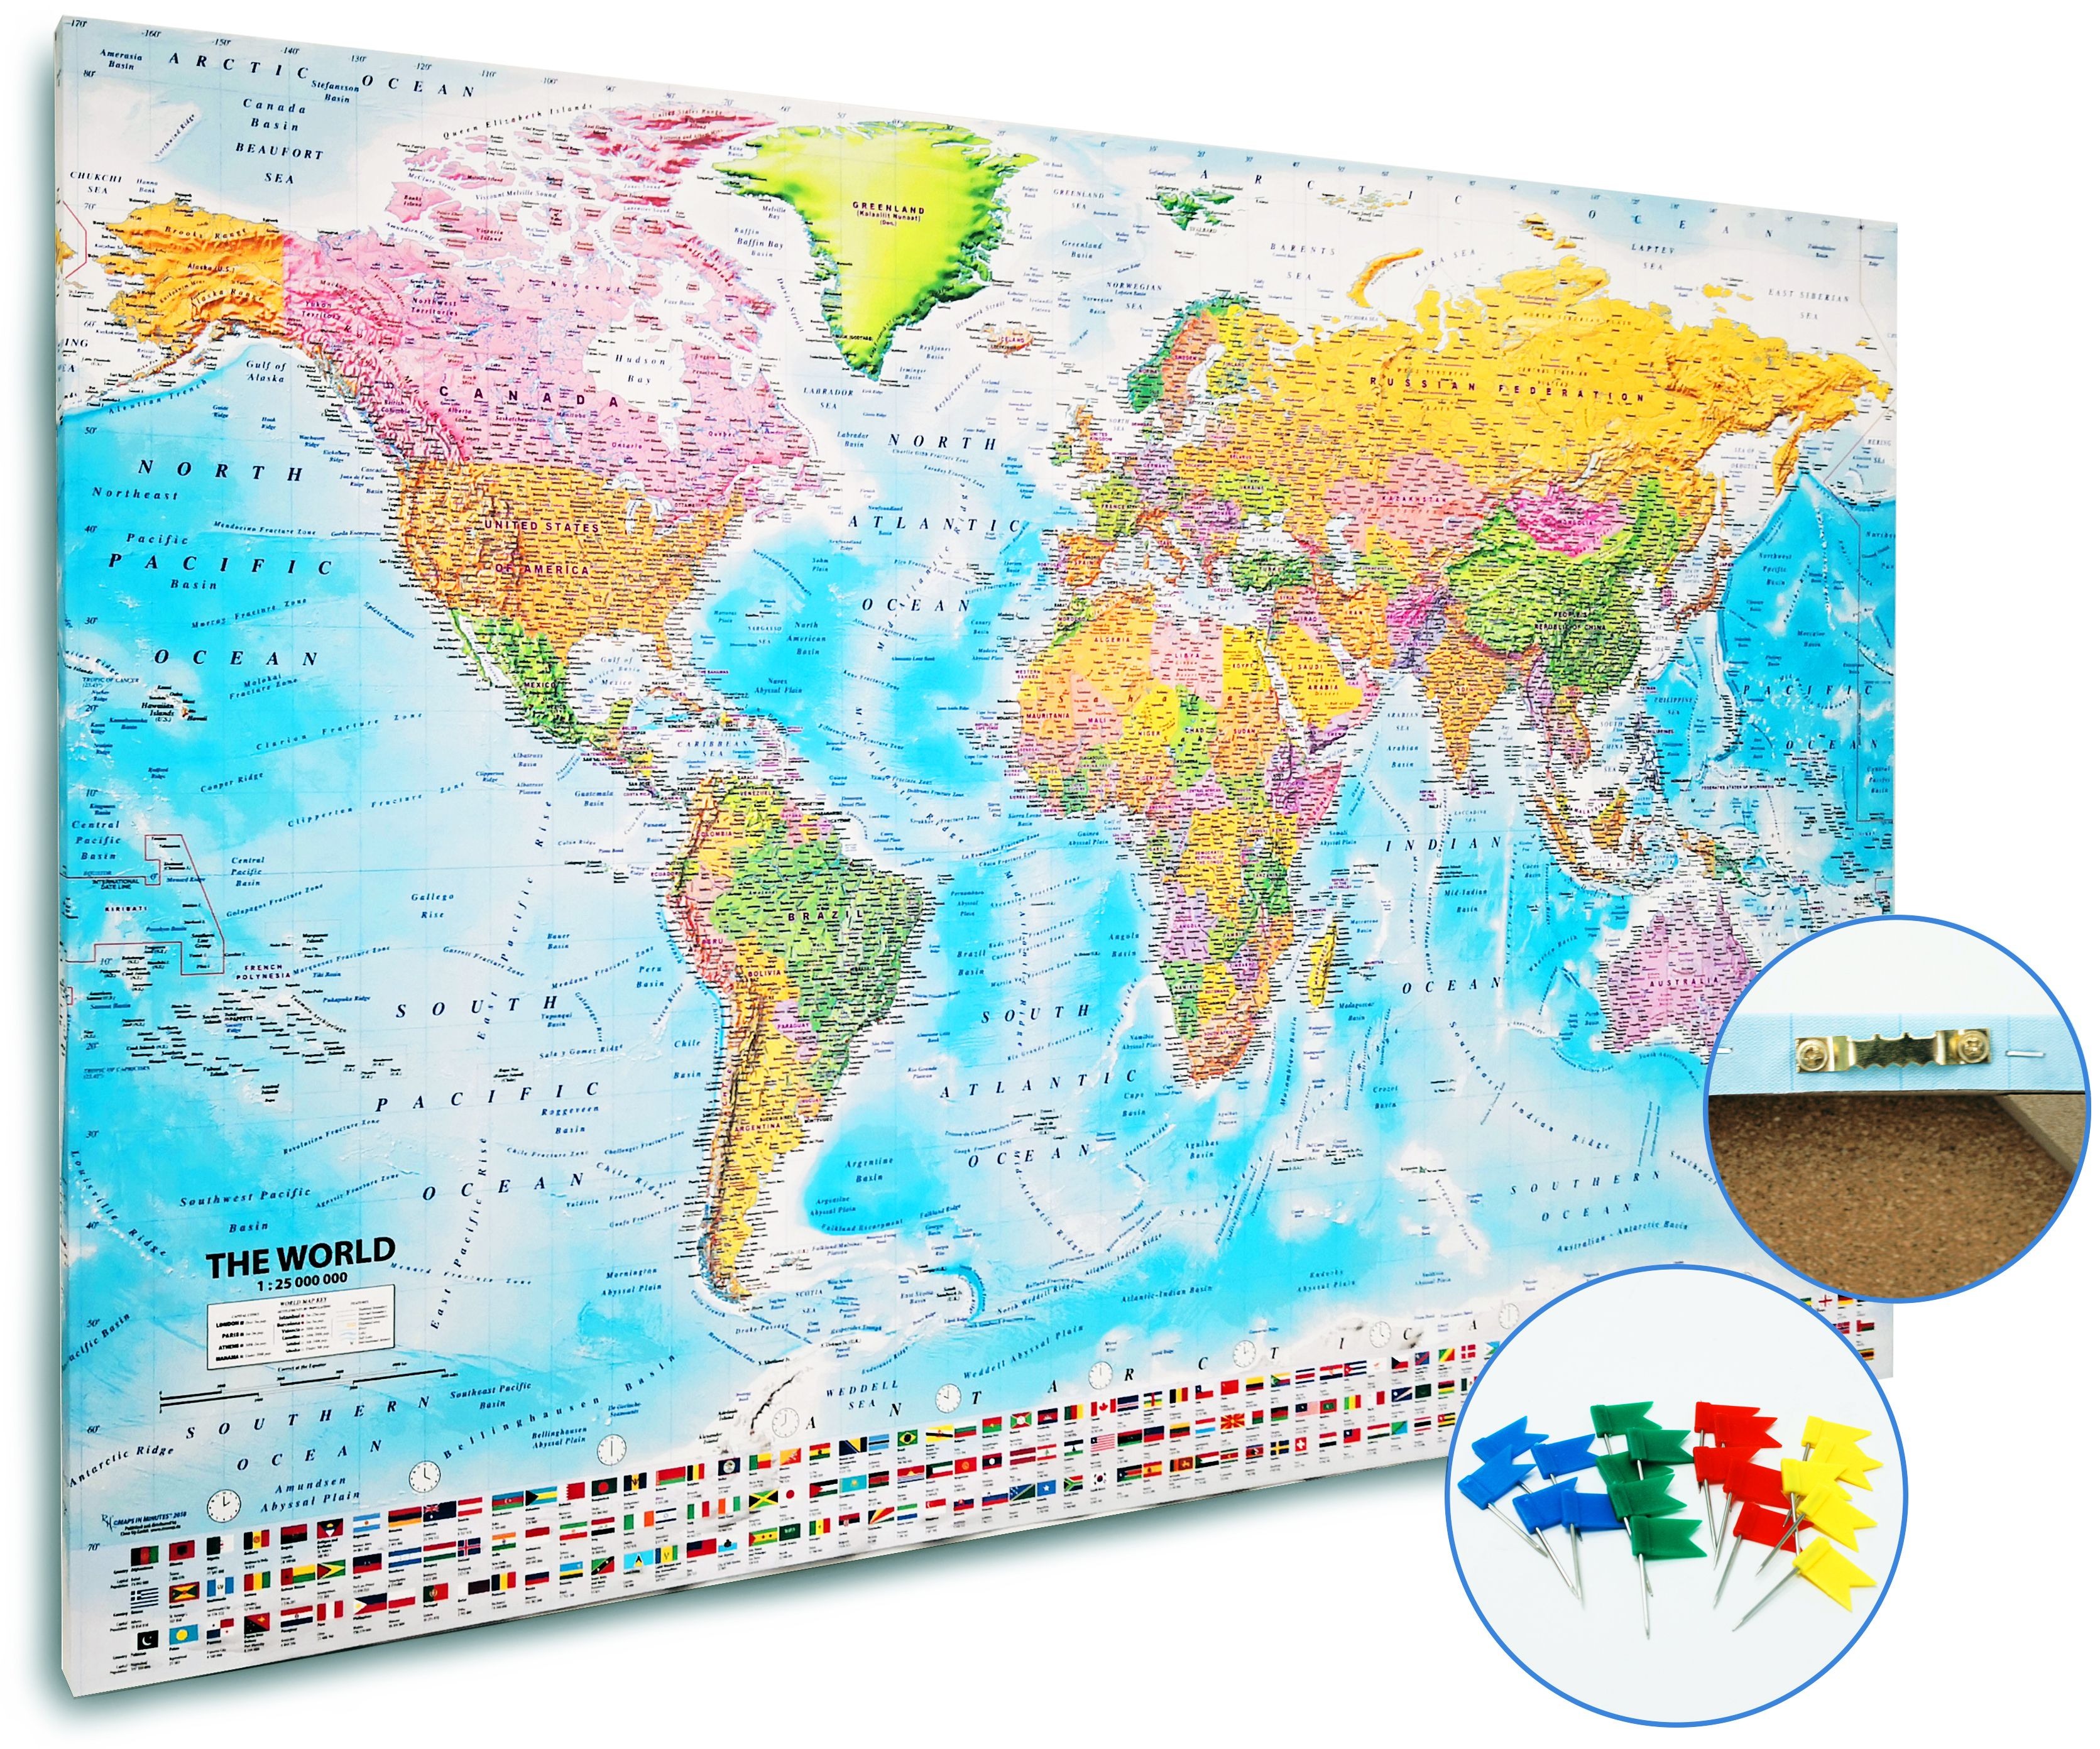 Weltkarte Pinnwand Xxl 2018 In 2020 Weltkarte Pinnwand